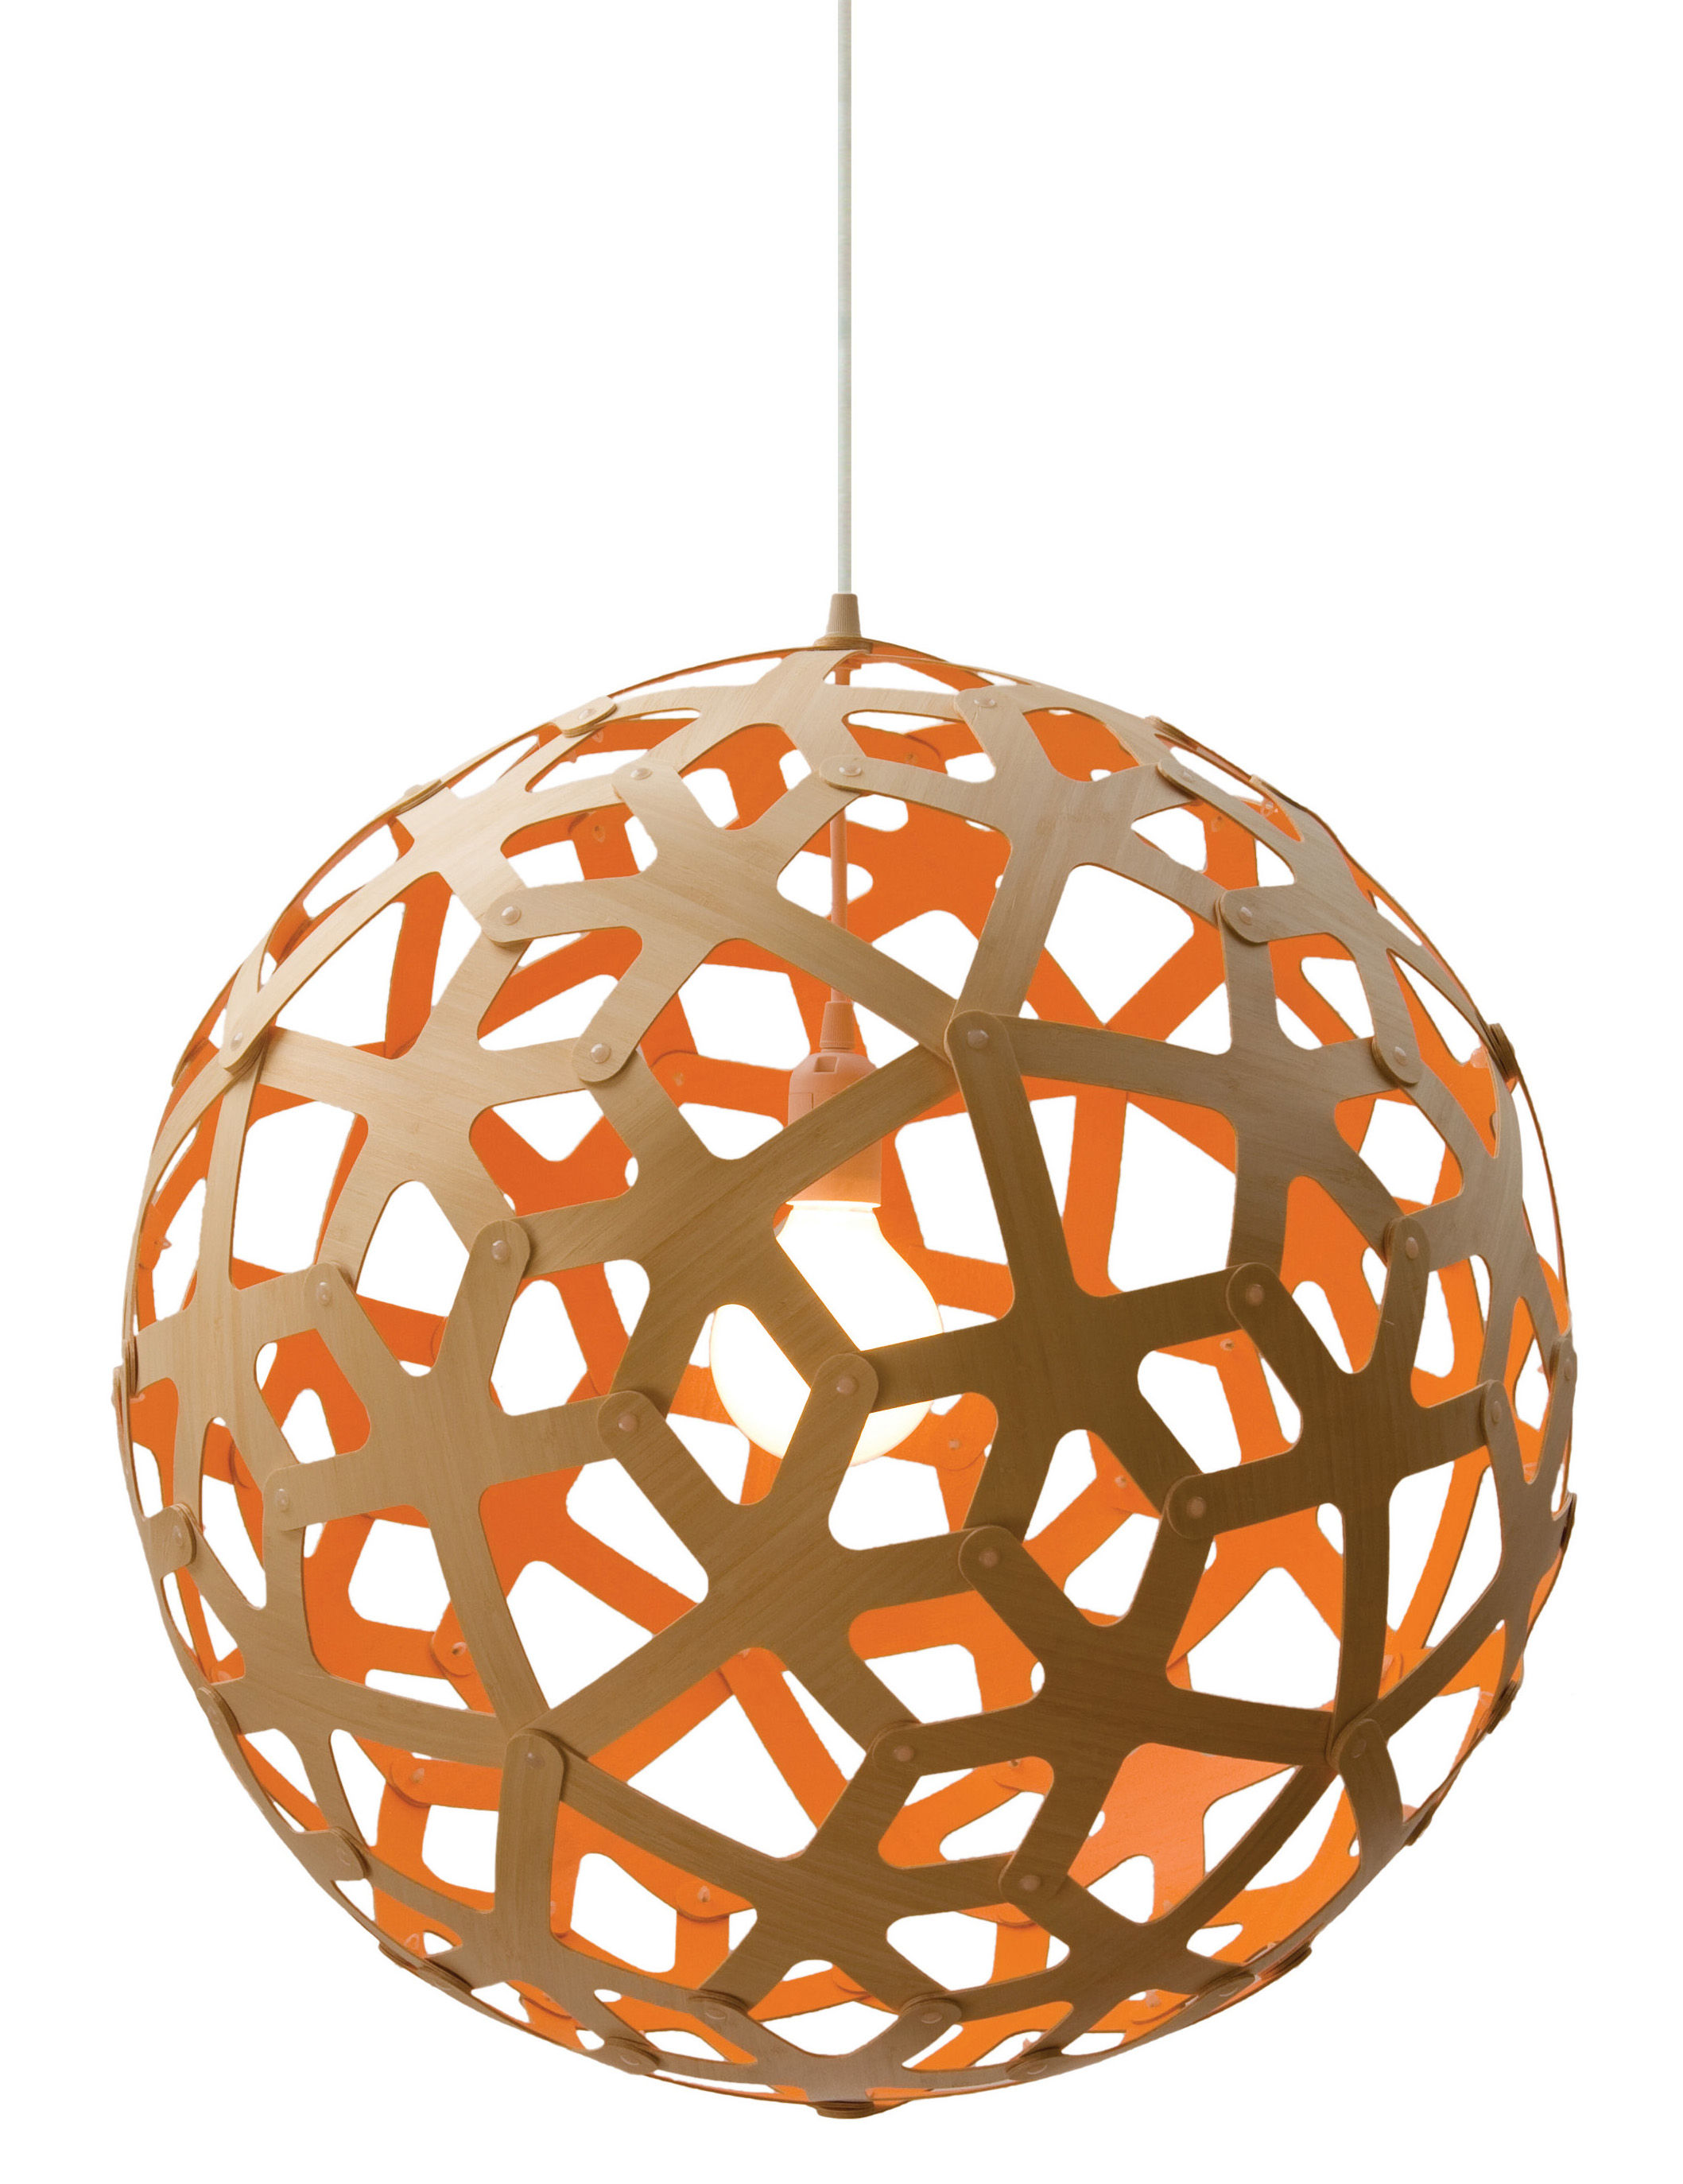 Lighting - Pendant Lighting - Coral Pendant - / Ø 60 cm - Bicoloured by David Trubridge - Orange / Natural wood - Pine